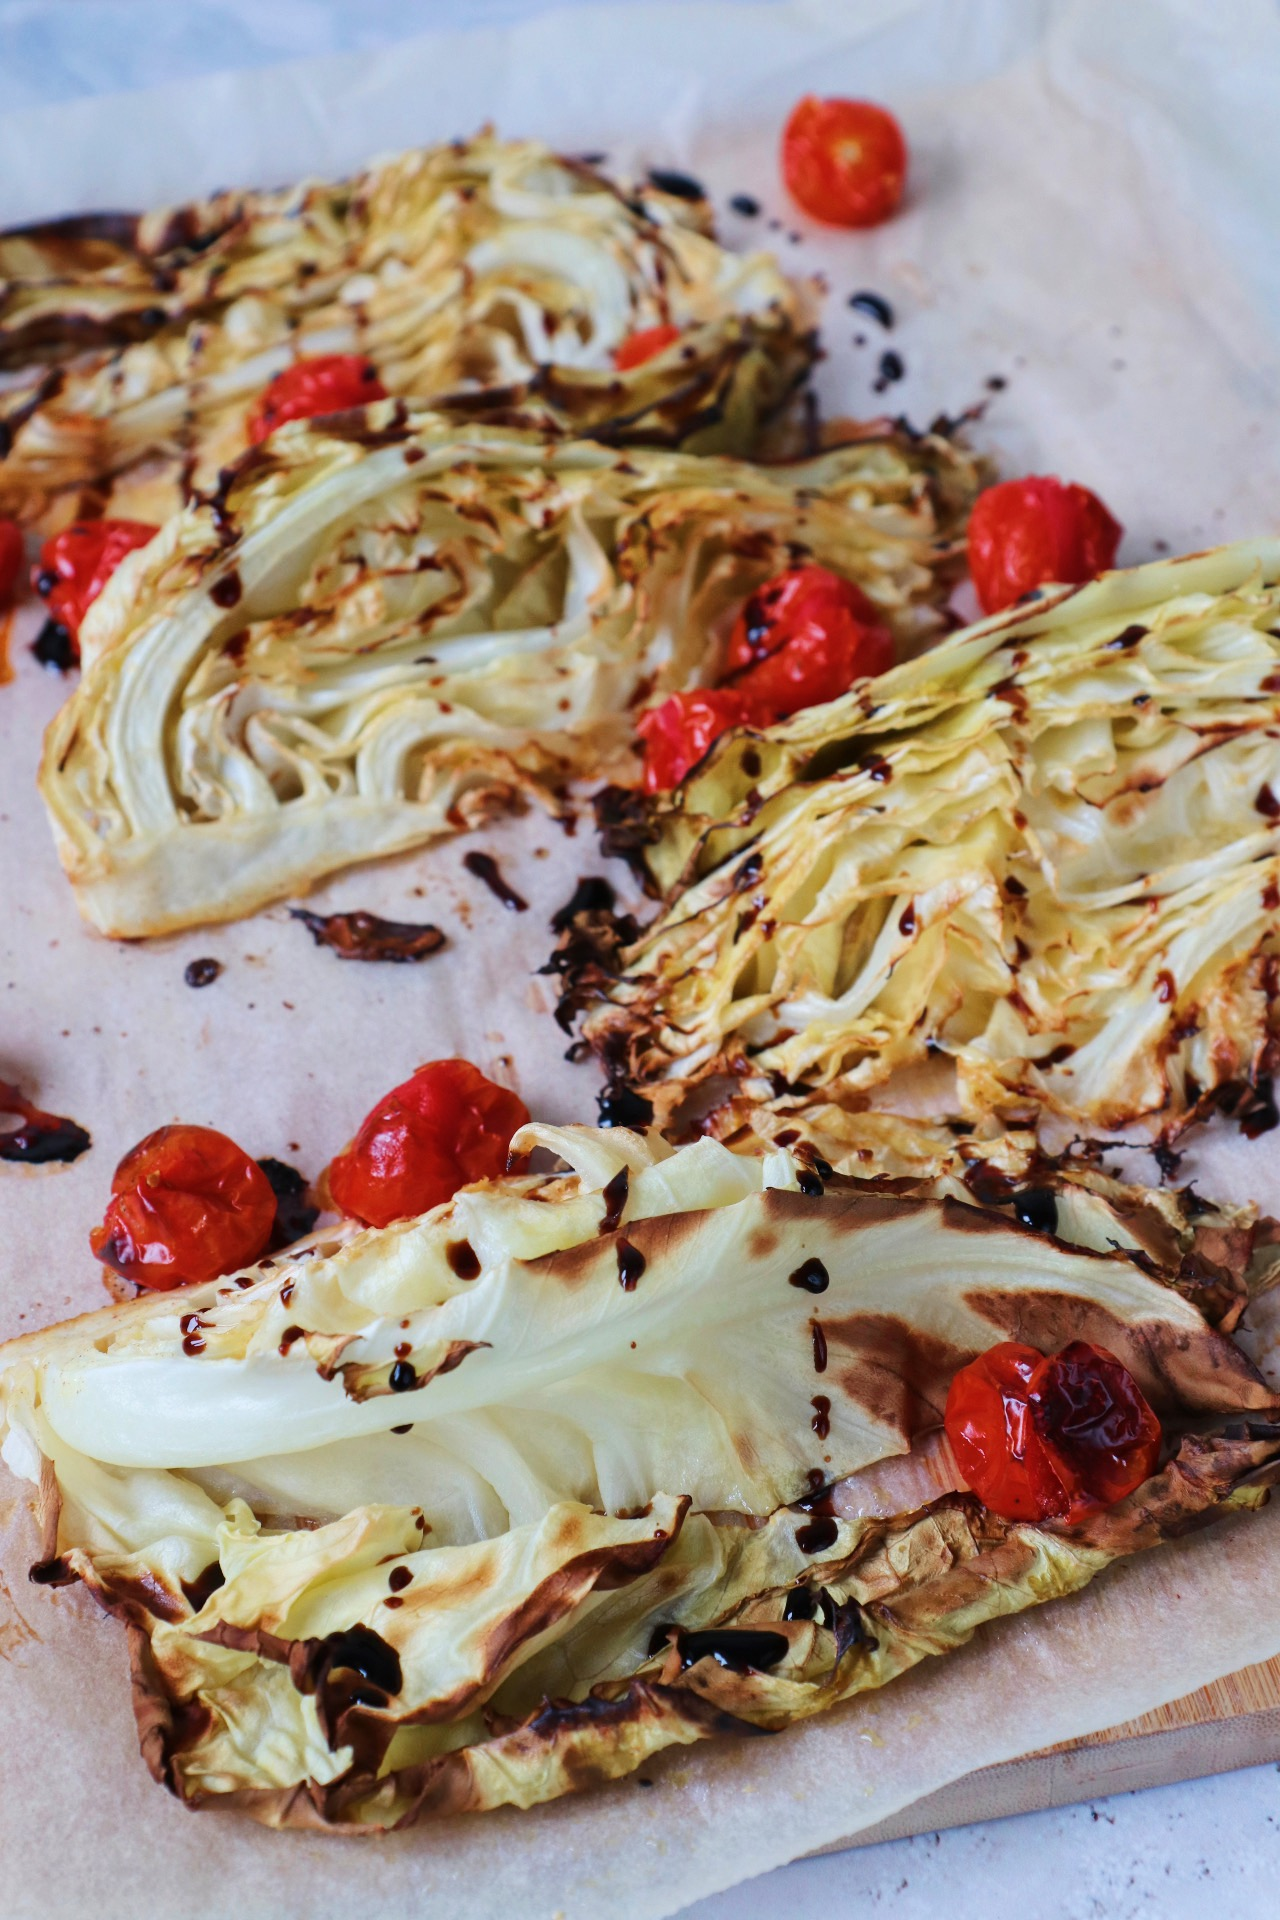 Geroosterde spitskool met cherrytomaat www.jaimyskitchen.nl